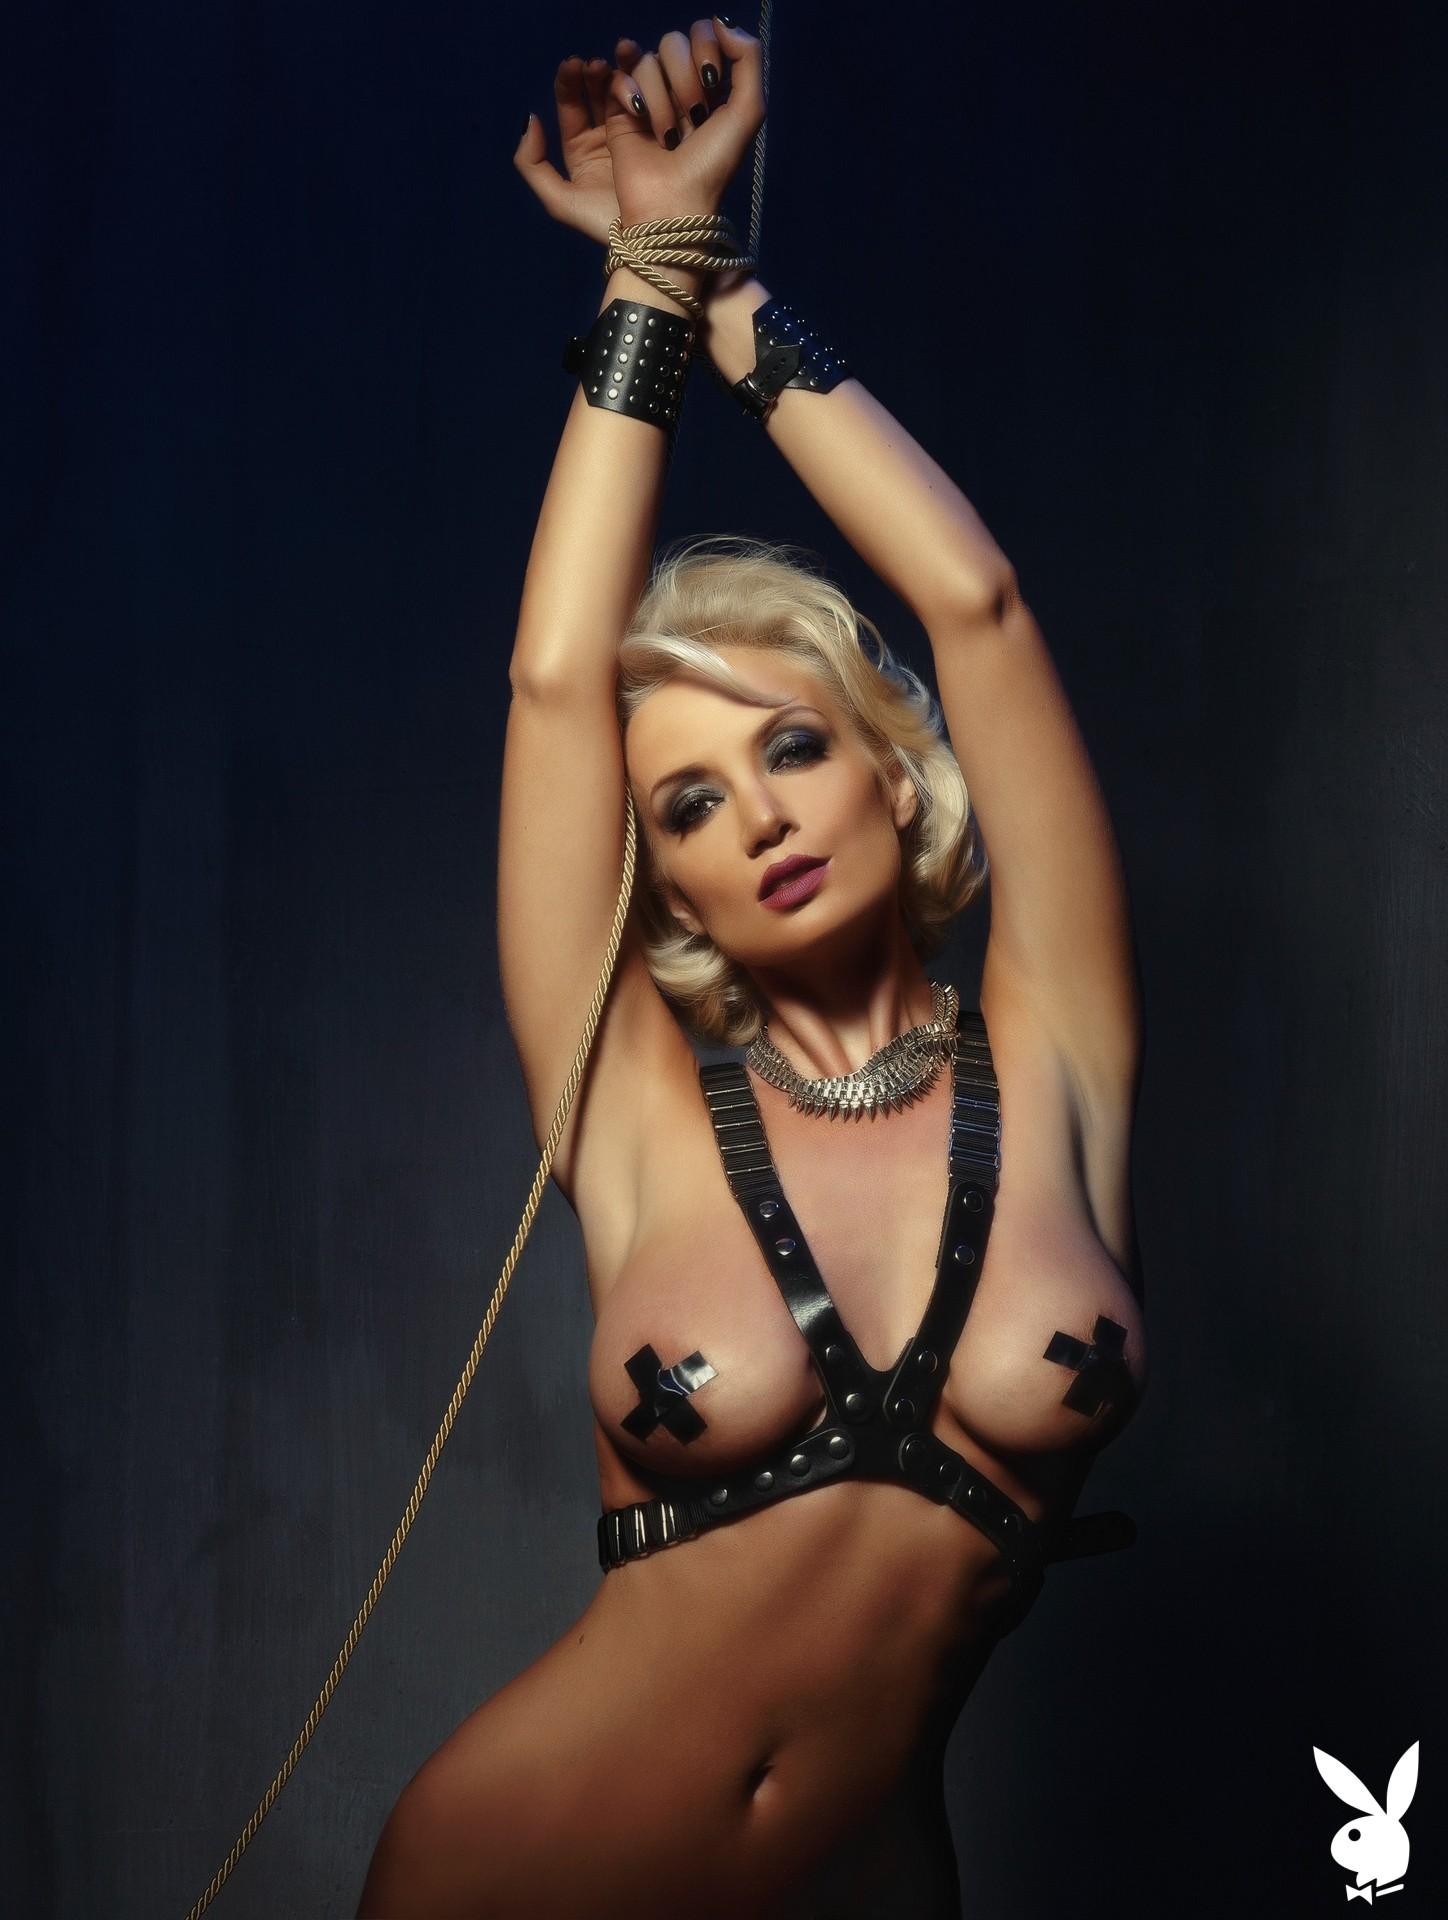 Bondage, Harness, Body Harness, Black Body Harness, Black Harness, Nipple Pasties, Thong, Black Thong, Bdsm, Handcuffs, Tied, Rope, Fetish